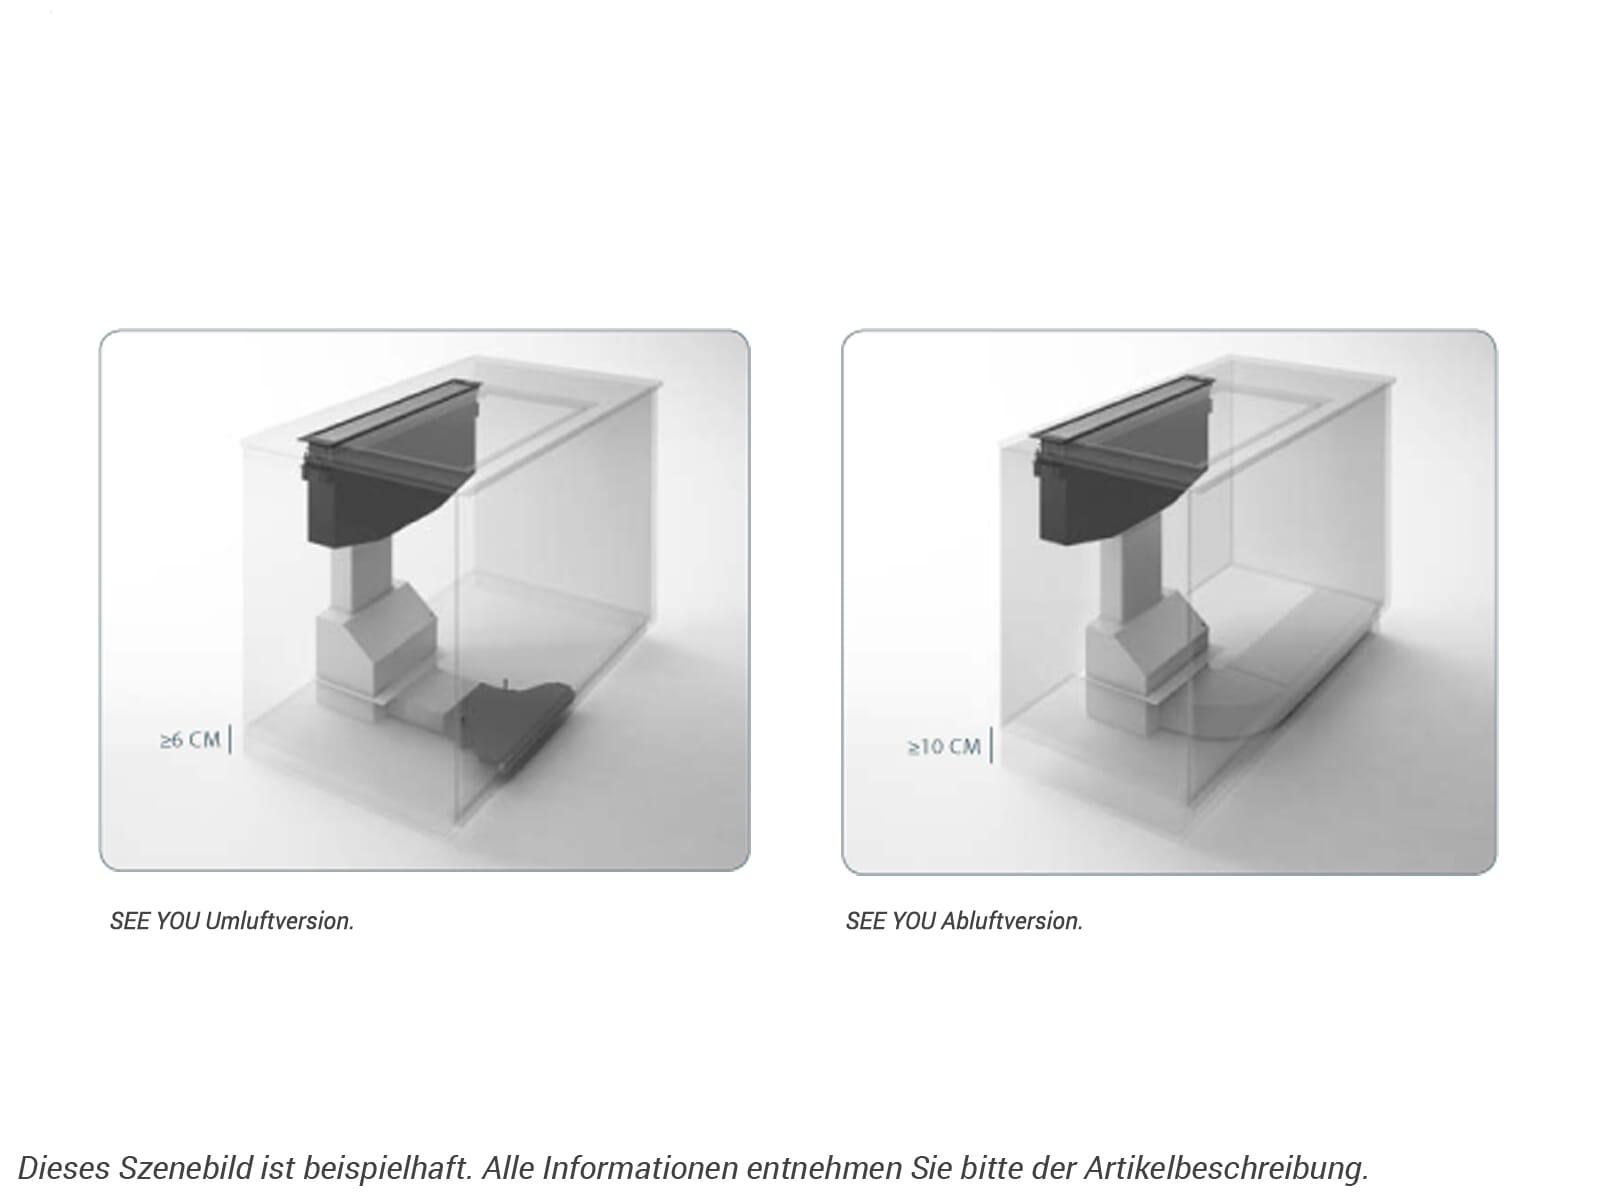 Elica See You PRF0120983 Tischhaube Edelstahl/Klares Glas